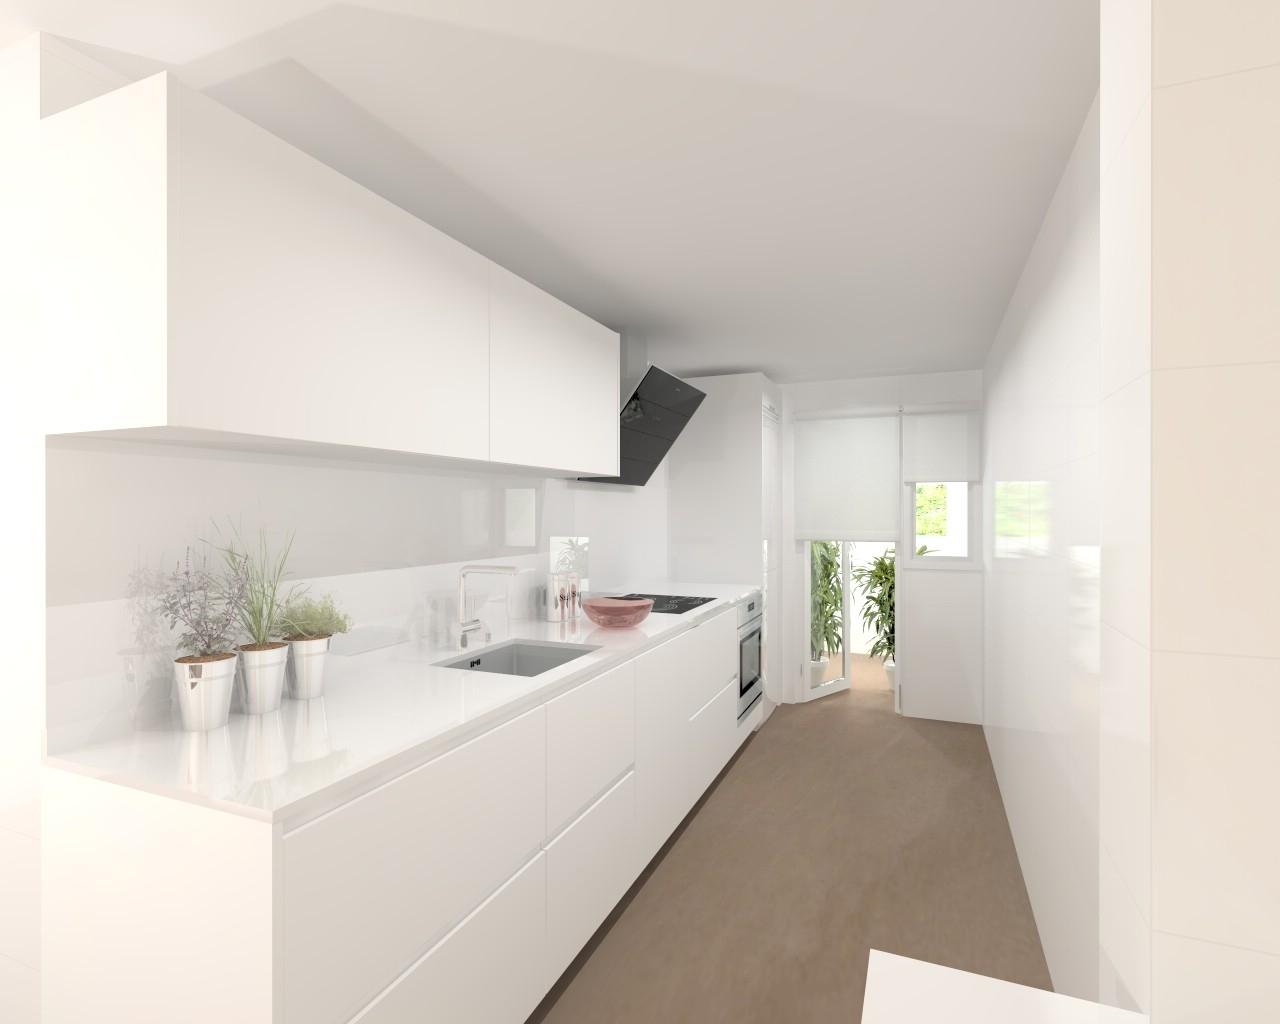 Proyectos de cocinas docrys cocinas for Cocinas angostas